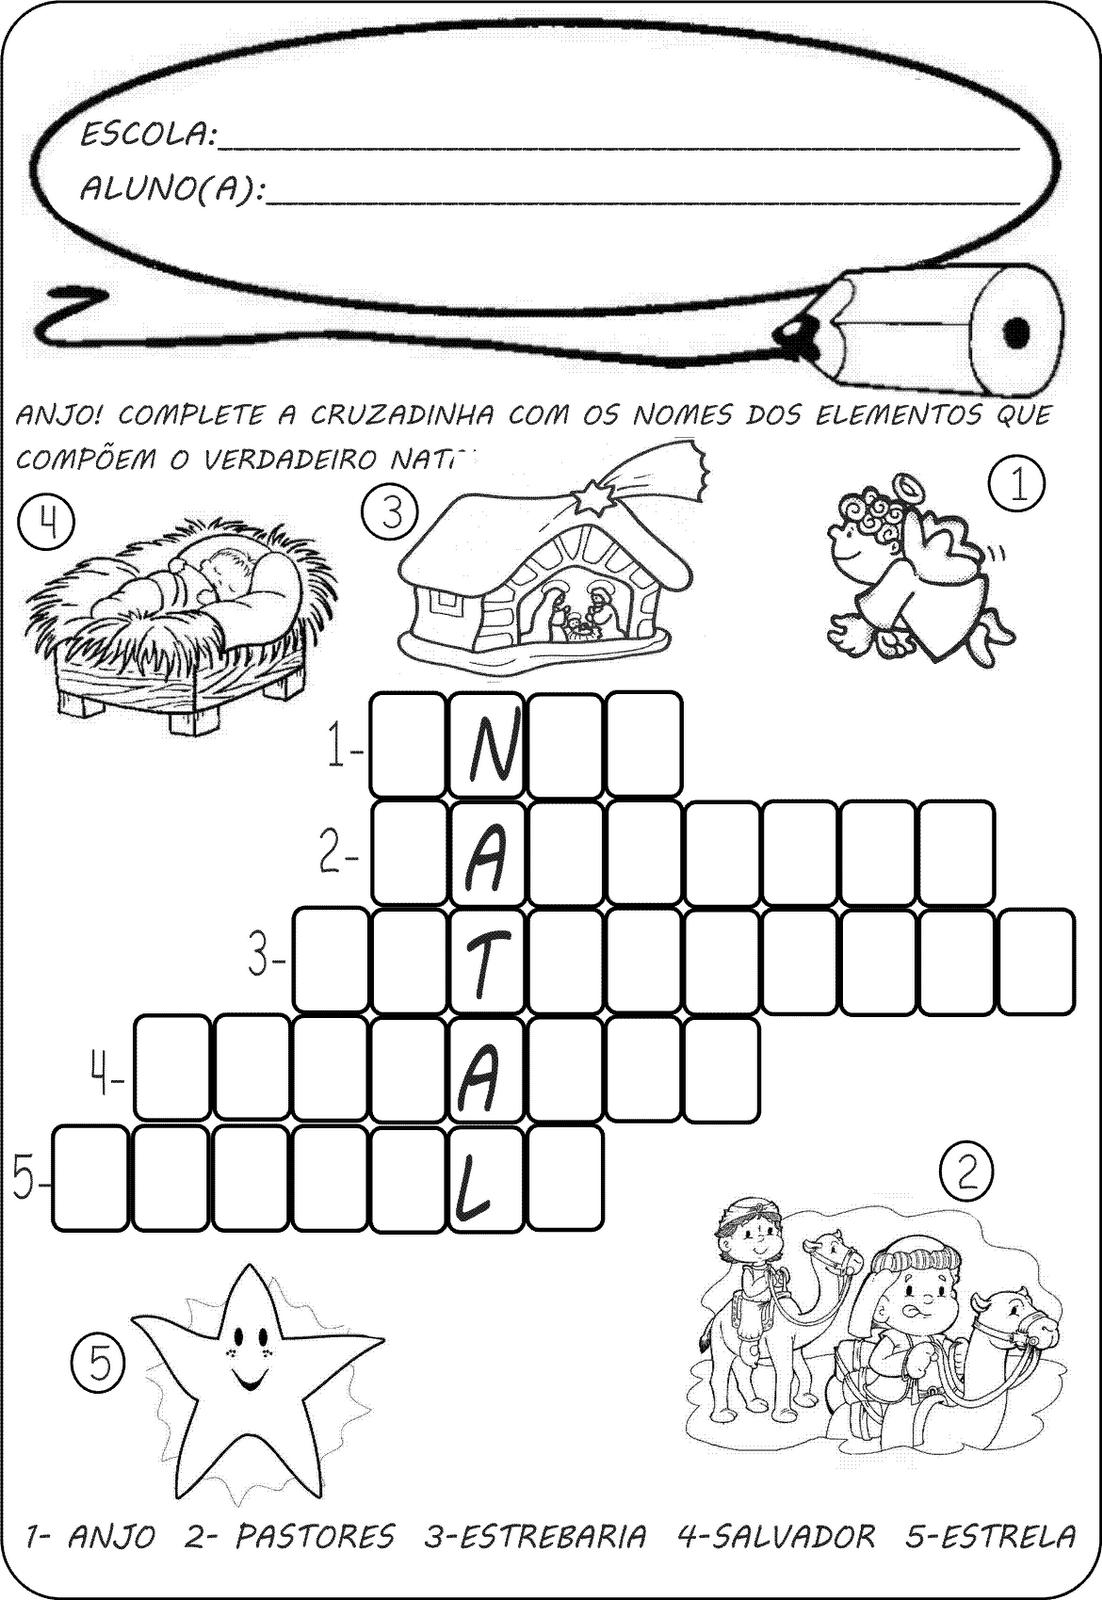 Exercicios Natal Colorir E Caca Palavras Atividades Pedagogicas